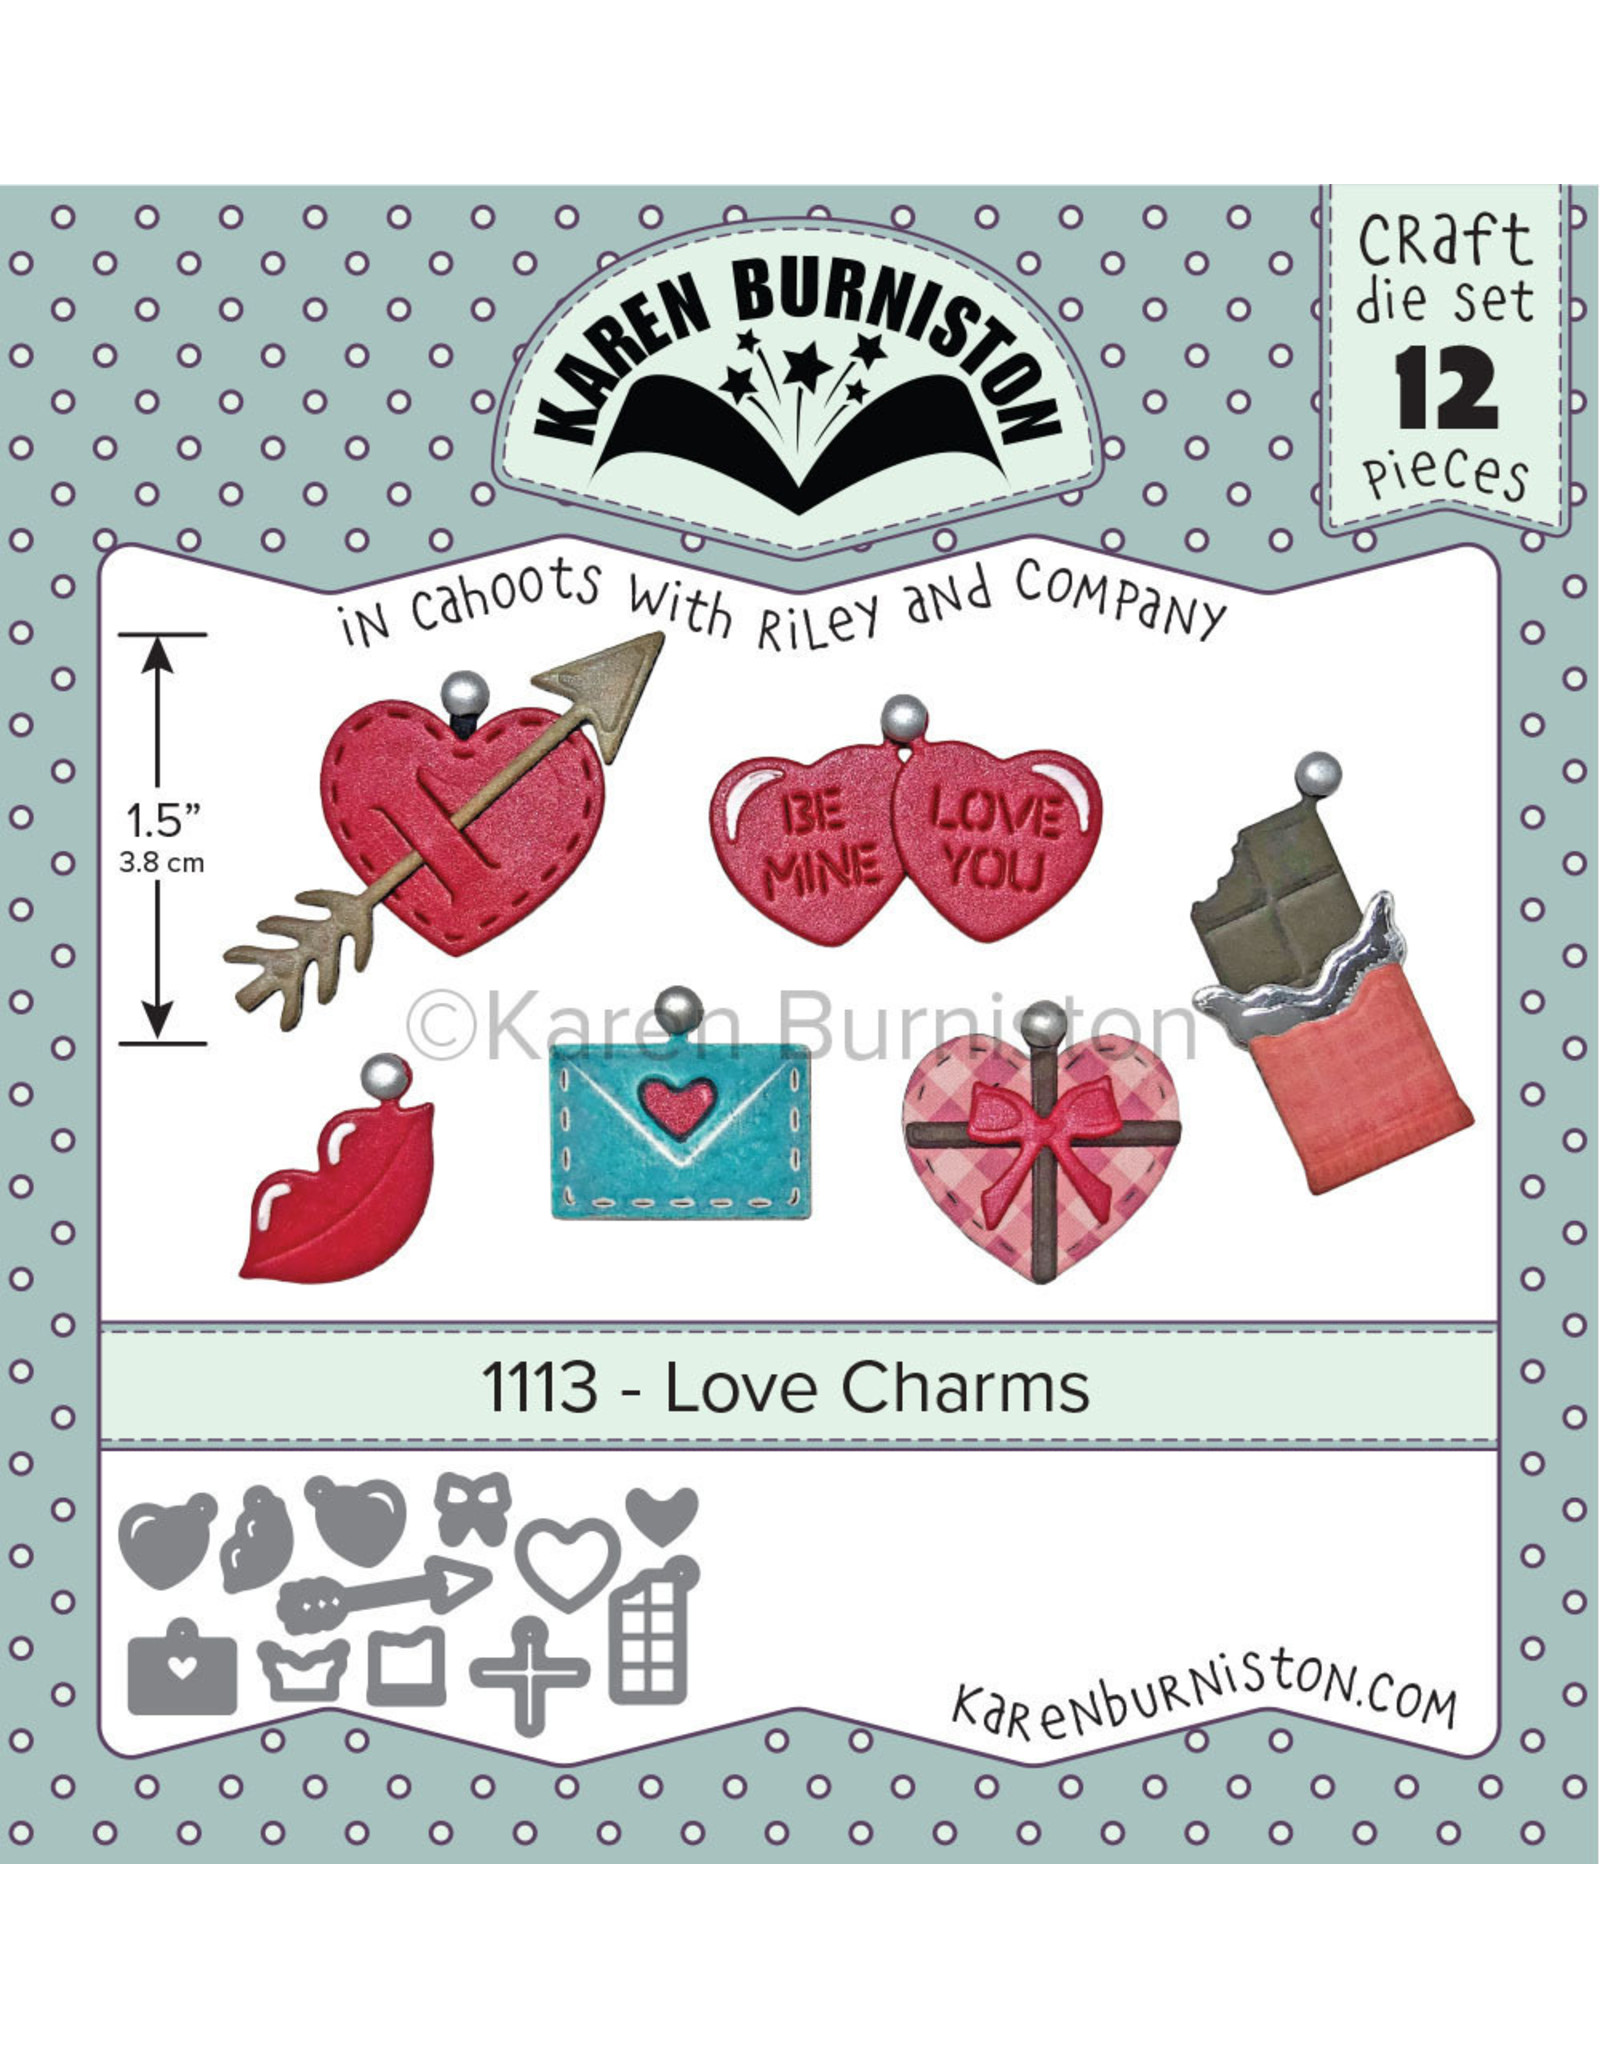 Karen Burniston Karen Burniston Love Charms 1113